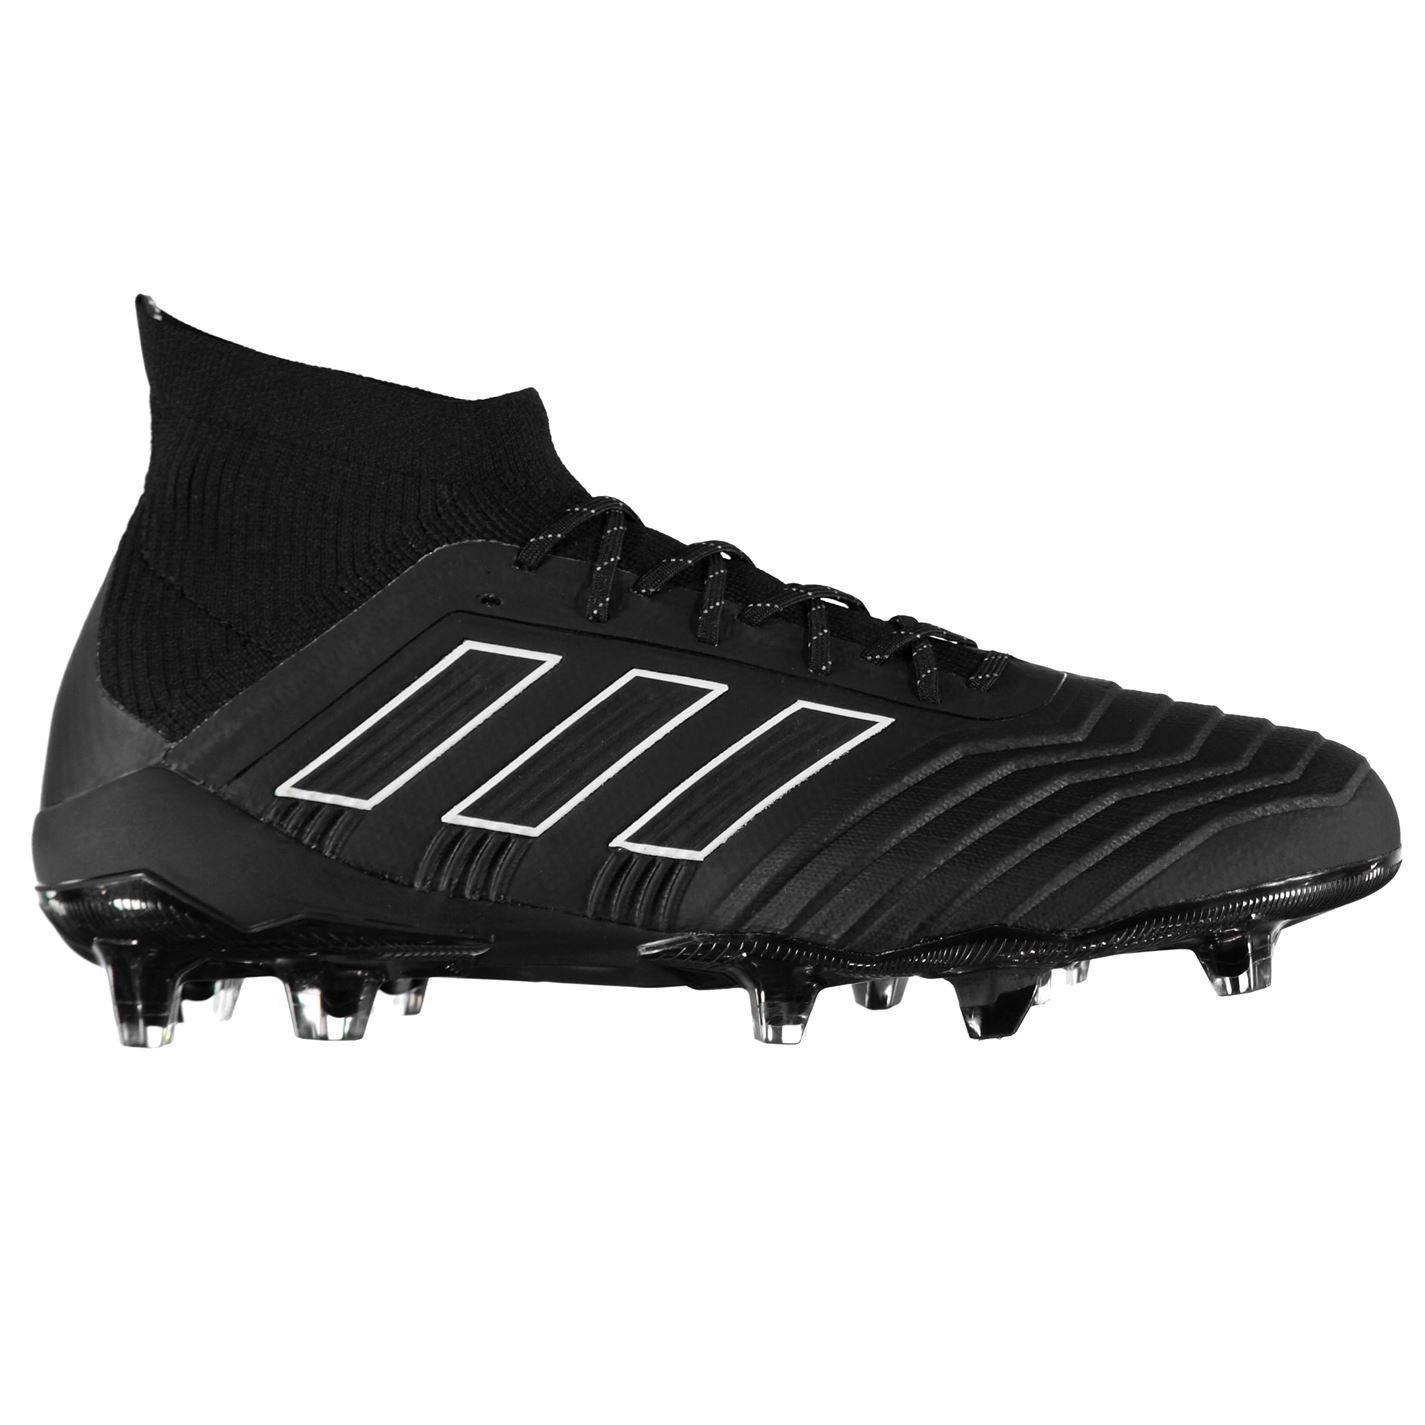 ... adidas Predator 18.1 FG Firm Ground Football Boots Mens Black Soccer  Shoe Cleats ... df3fc456f